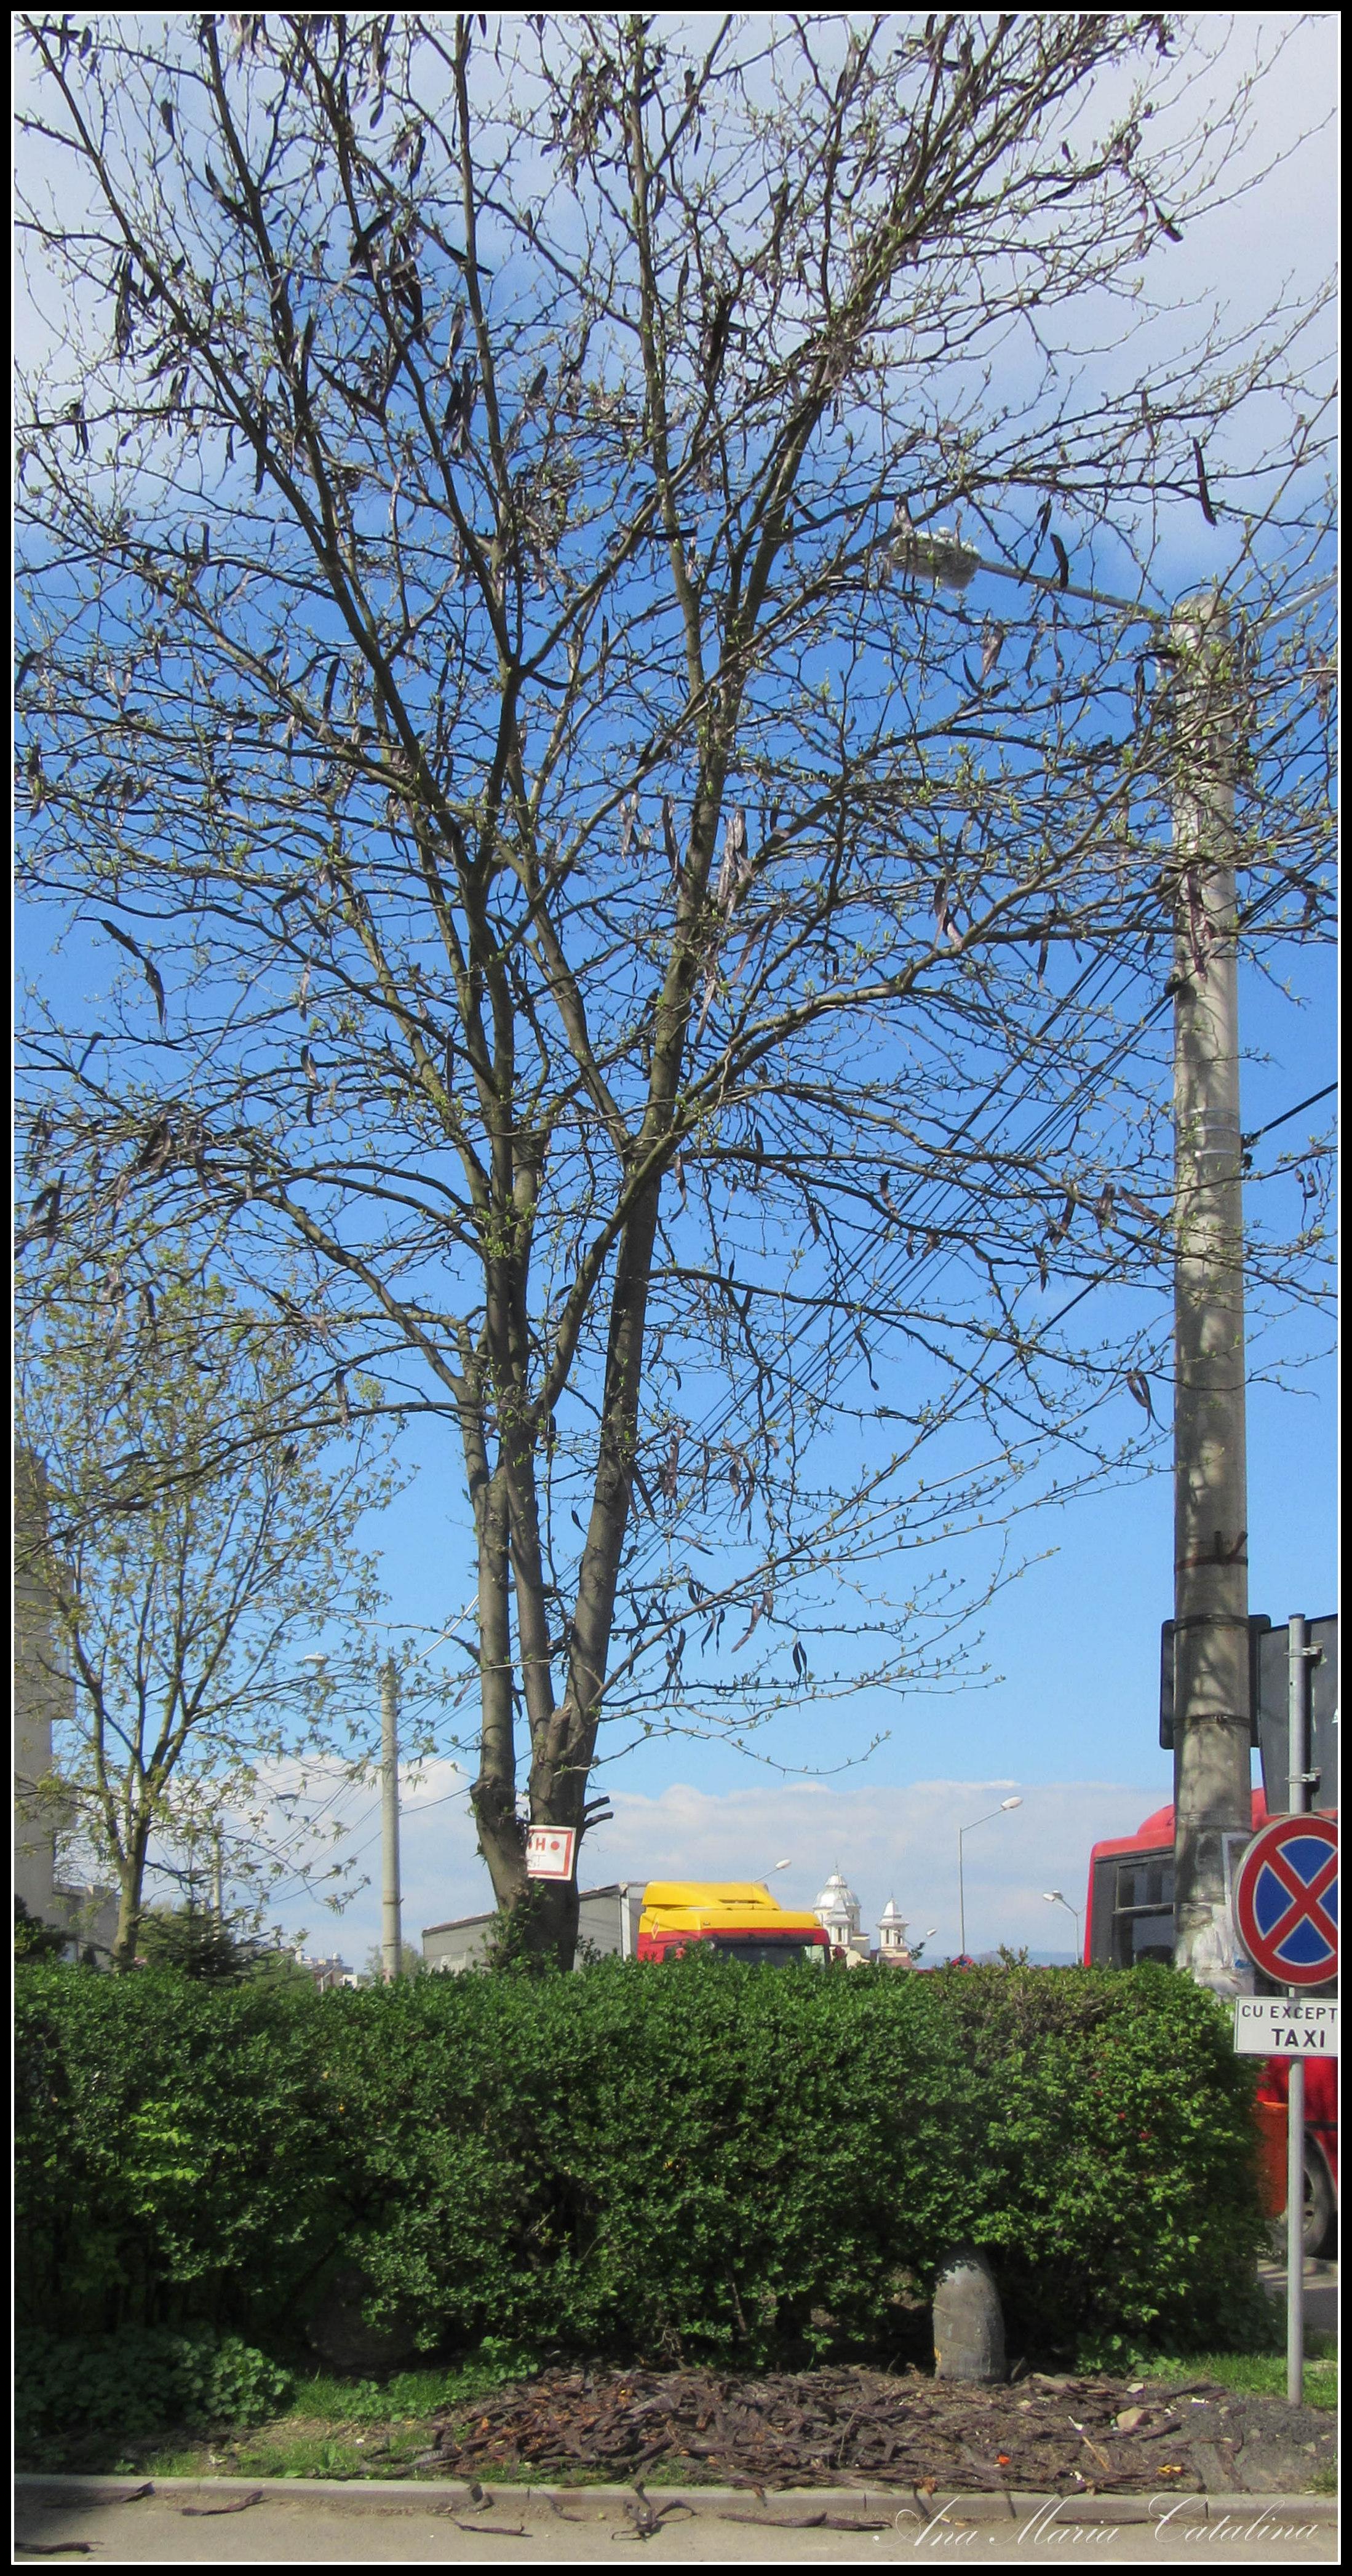 Photo: Glădița,  plătica  ( (Gleditschia triacanthos)  - de pe Calea Victoriei, Nr. 134 2016.04.15 album http://ana-maria-catalina.blogspot.ro/2016/04/gladita-platica-gleditschia-triacanthos.html